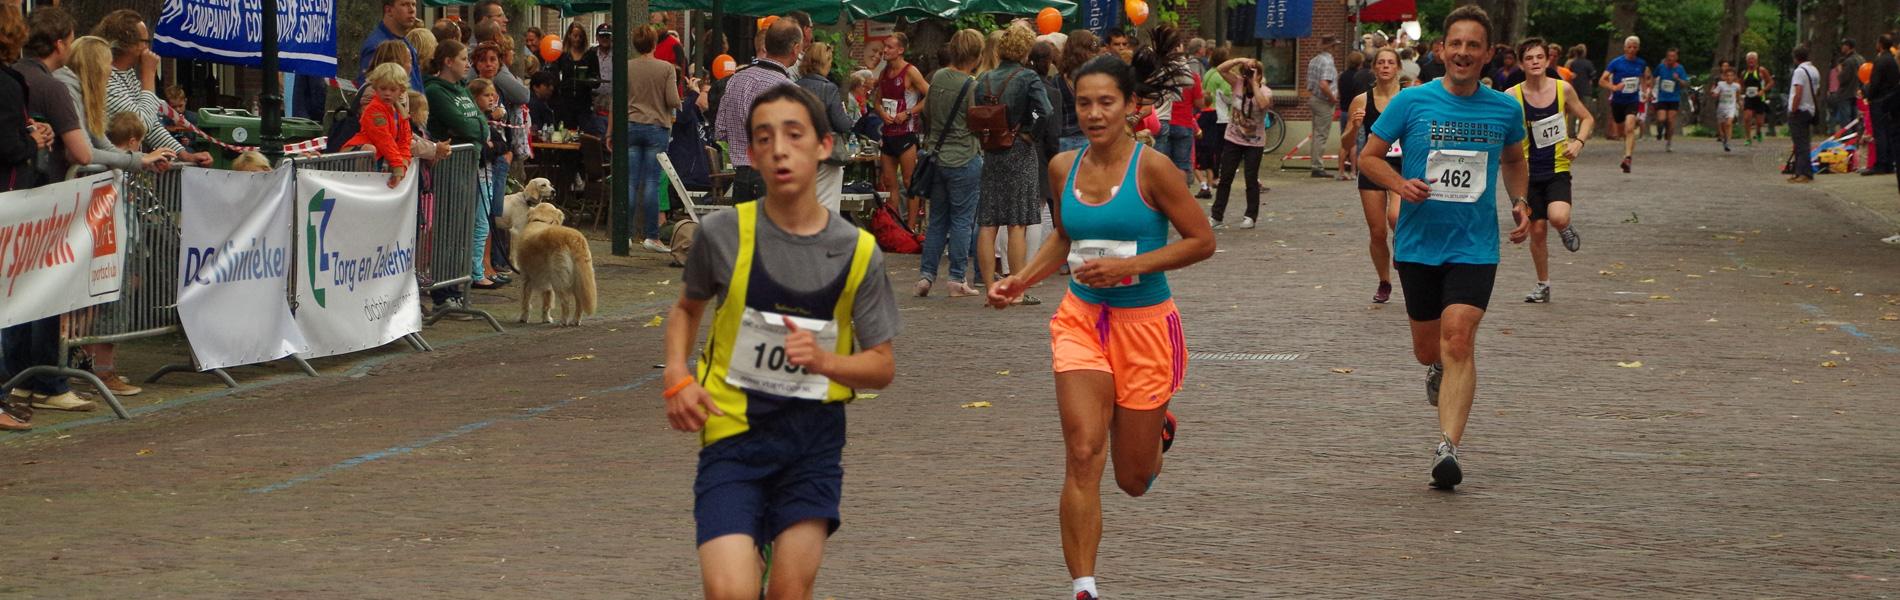 5km, 10km of 10 Engelse Mijl